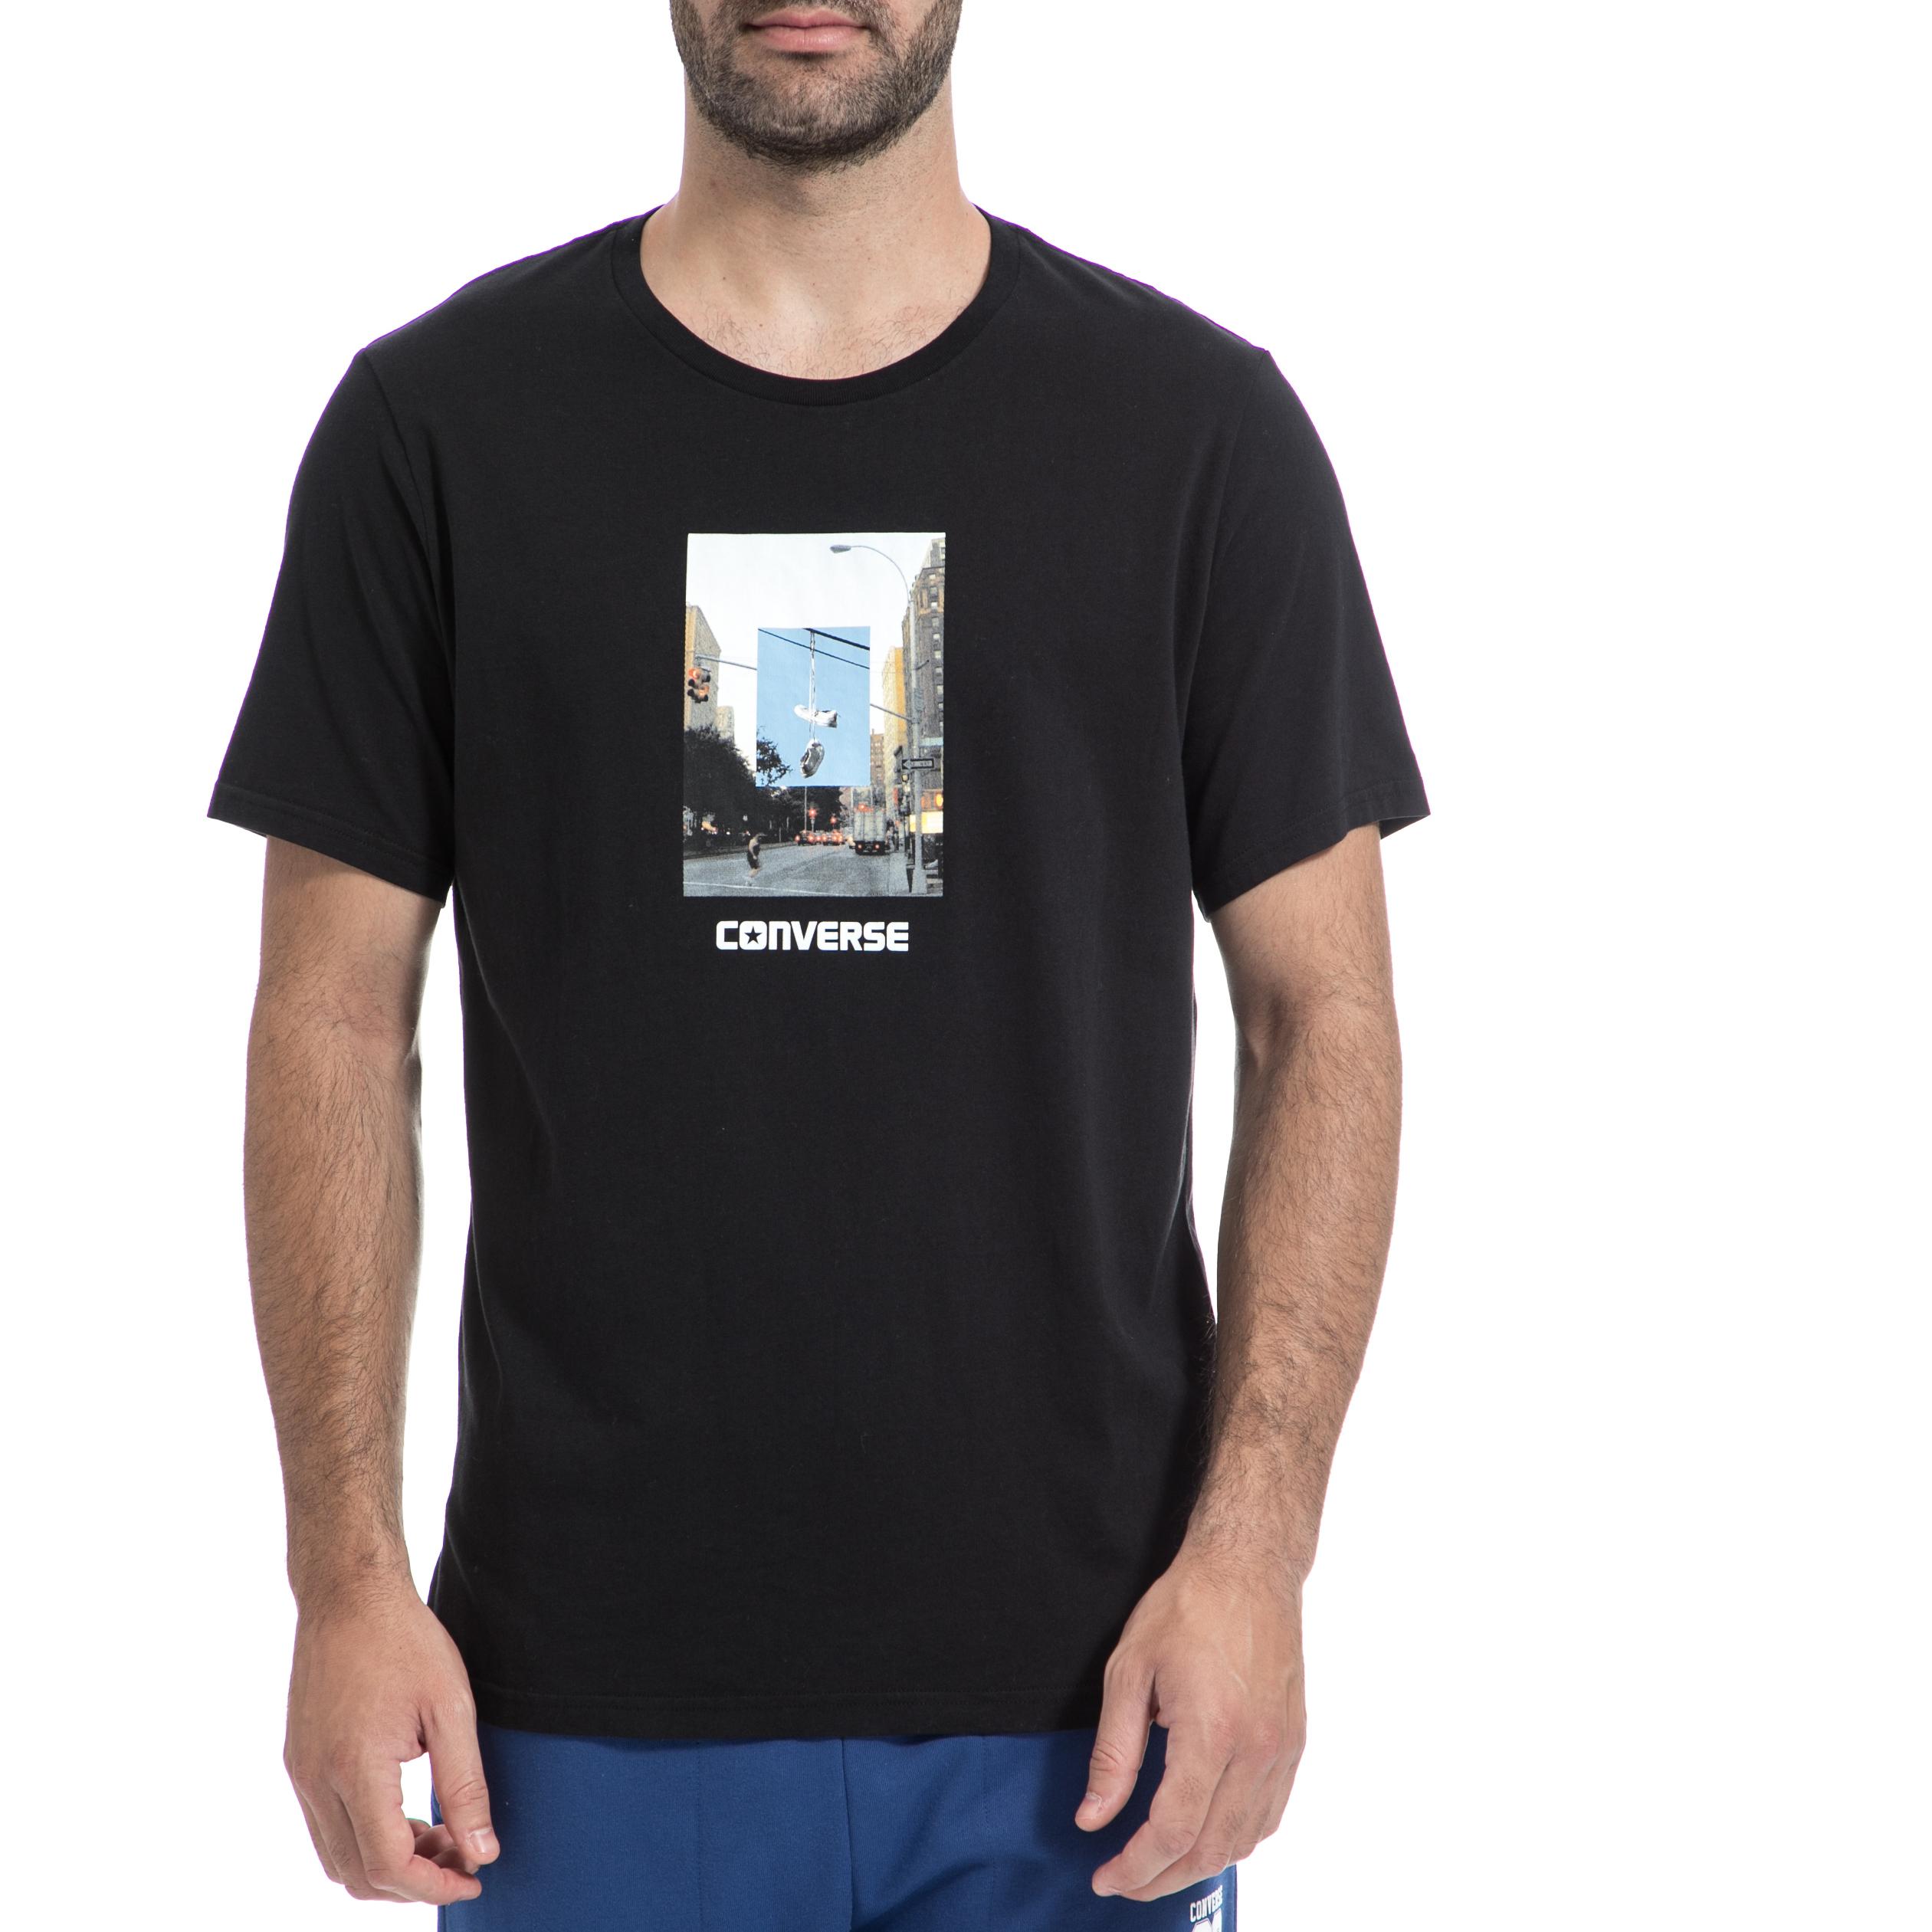 CONVERSE – Ανδρική μπλούζα CONVERSE μαύρη